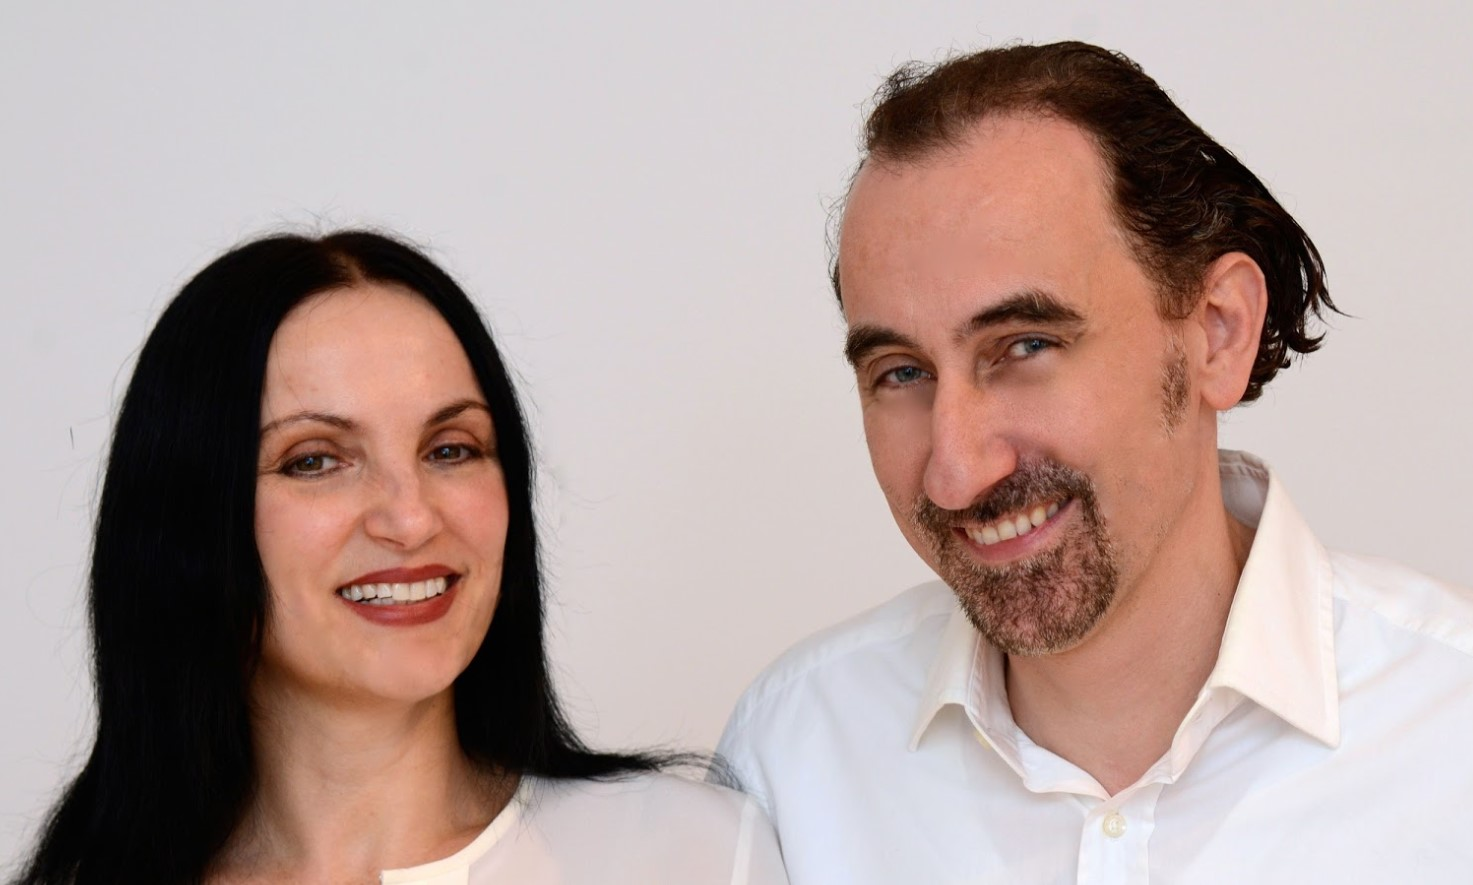 Zahnärztliche Praxis Köln Mitte   Dr. med. dent. Christof Frauenstein + Dr. med. dent. Christina Friedenwanger